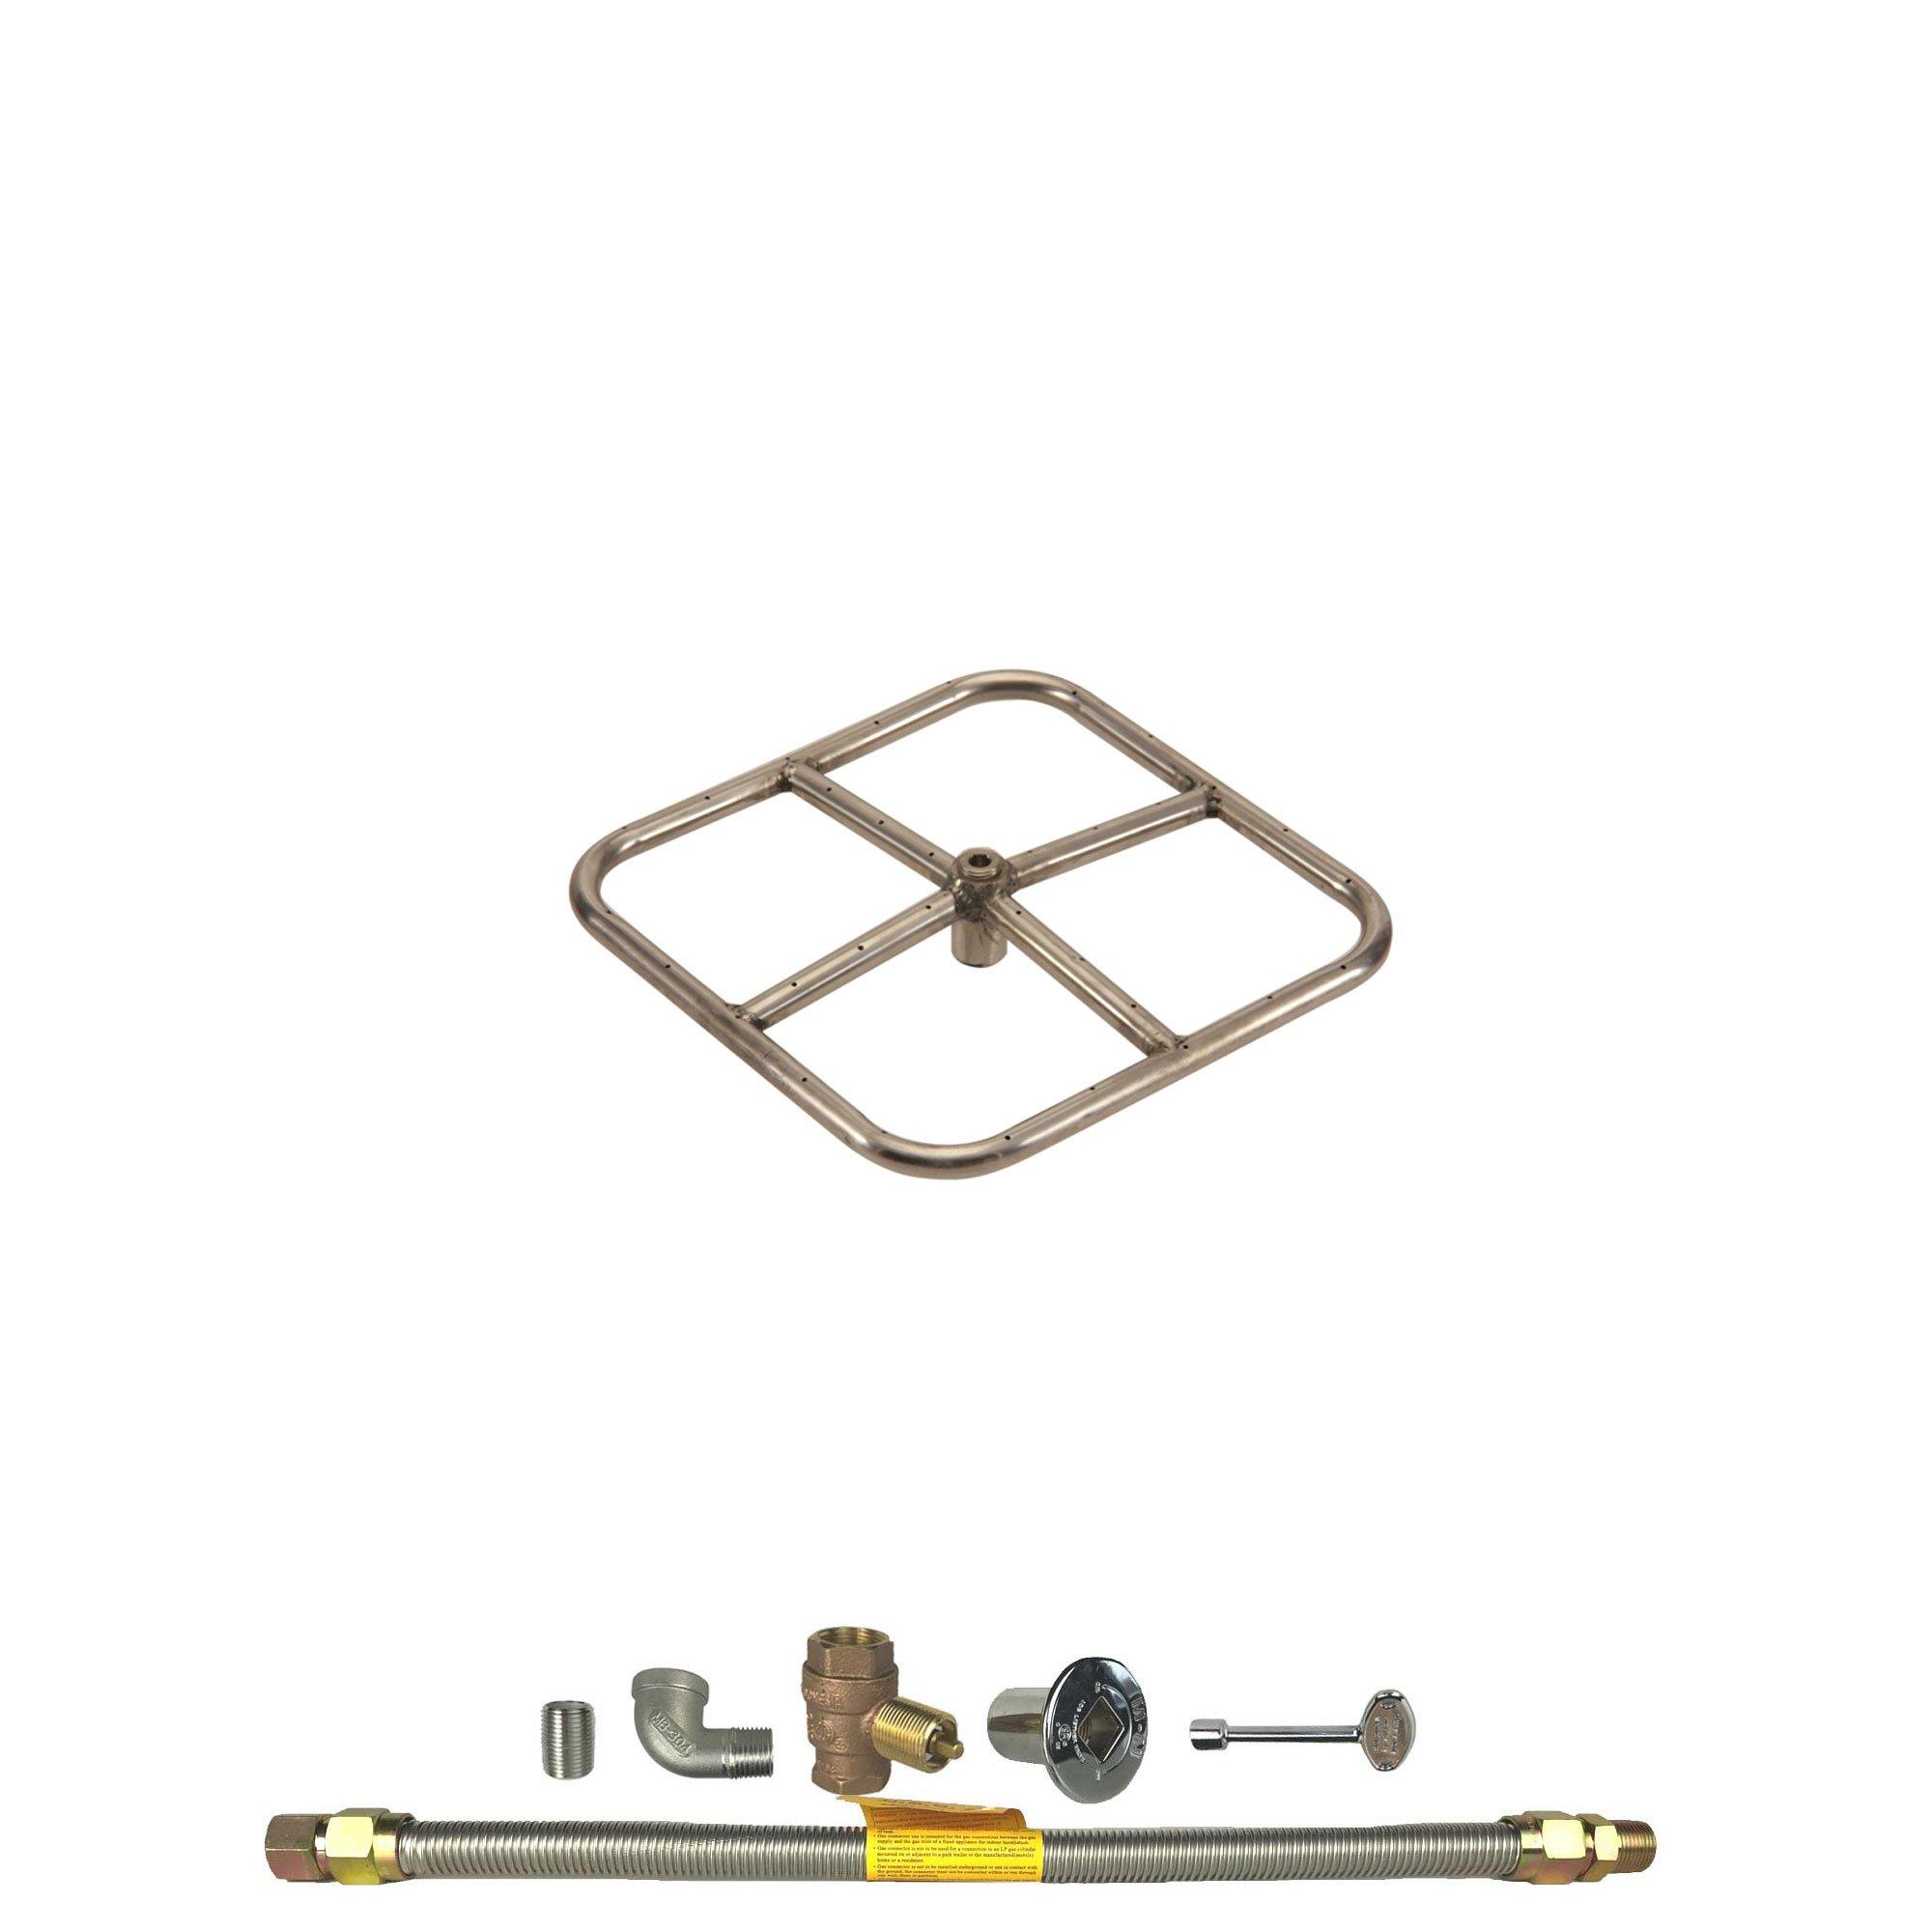 Spotix HPC Square Fire Pit Burner Kit (FPSSQ18KIT-NG-MSCB), 18x18-Inch Burner, Match Light, Natural Gas by Spotix